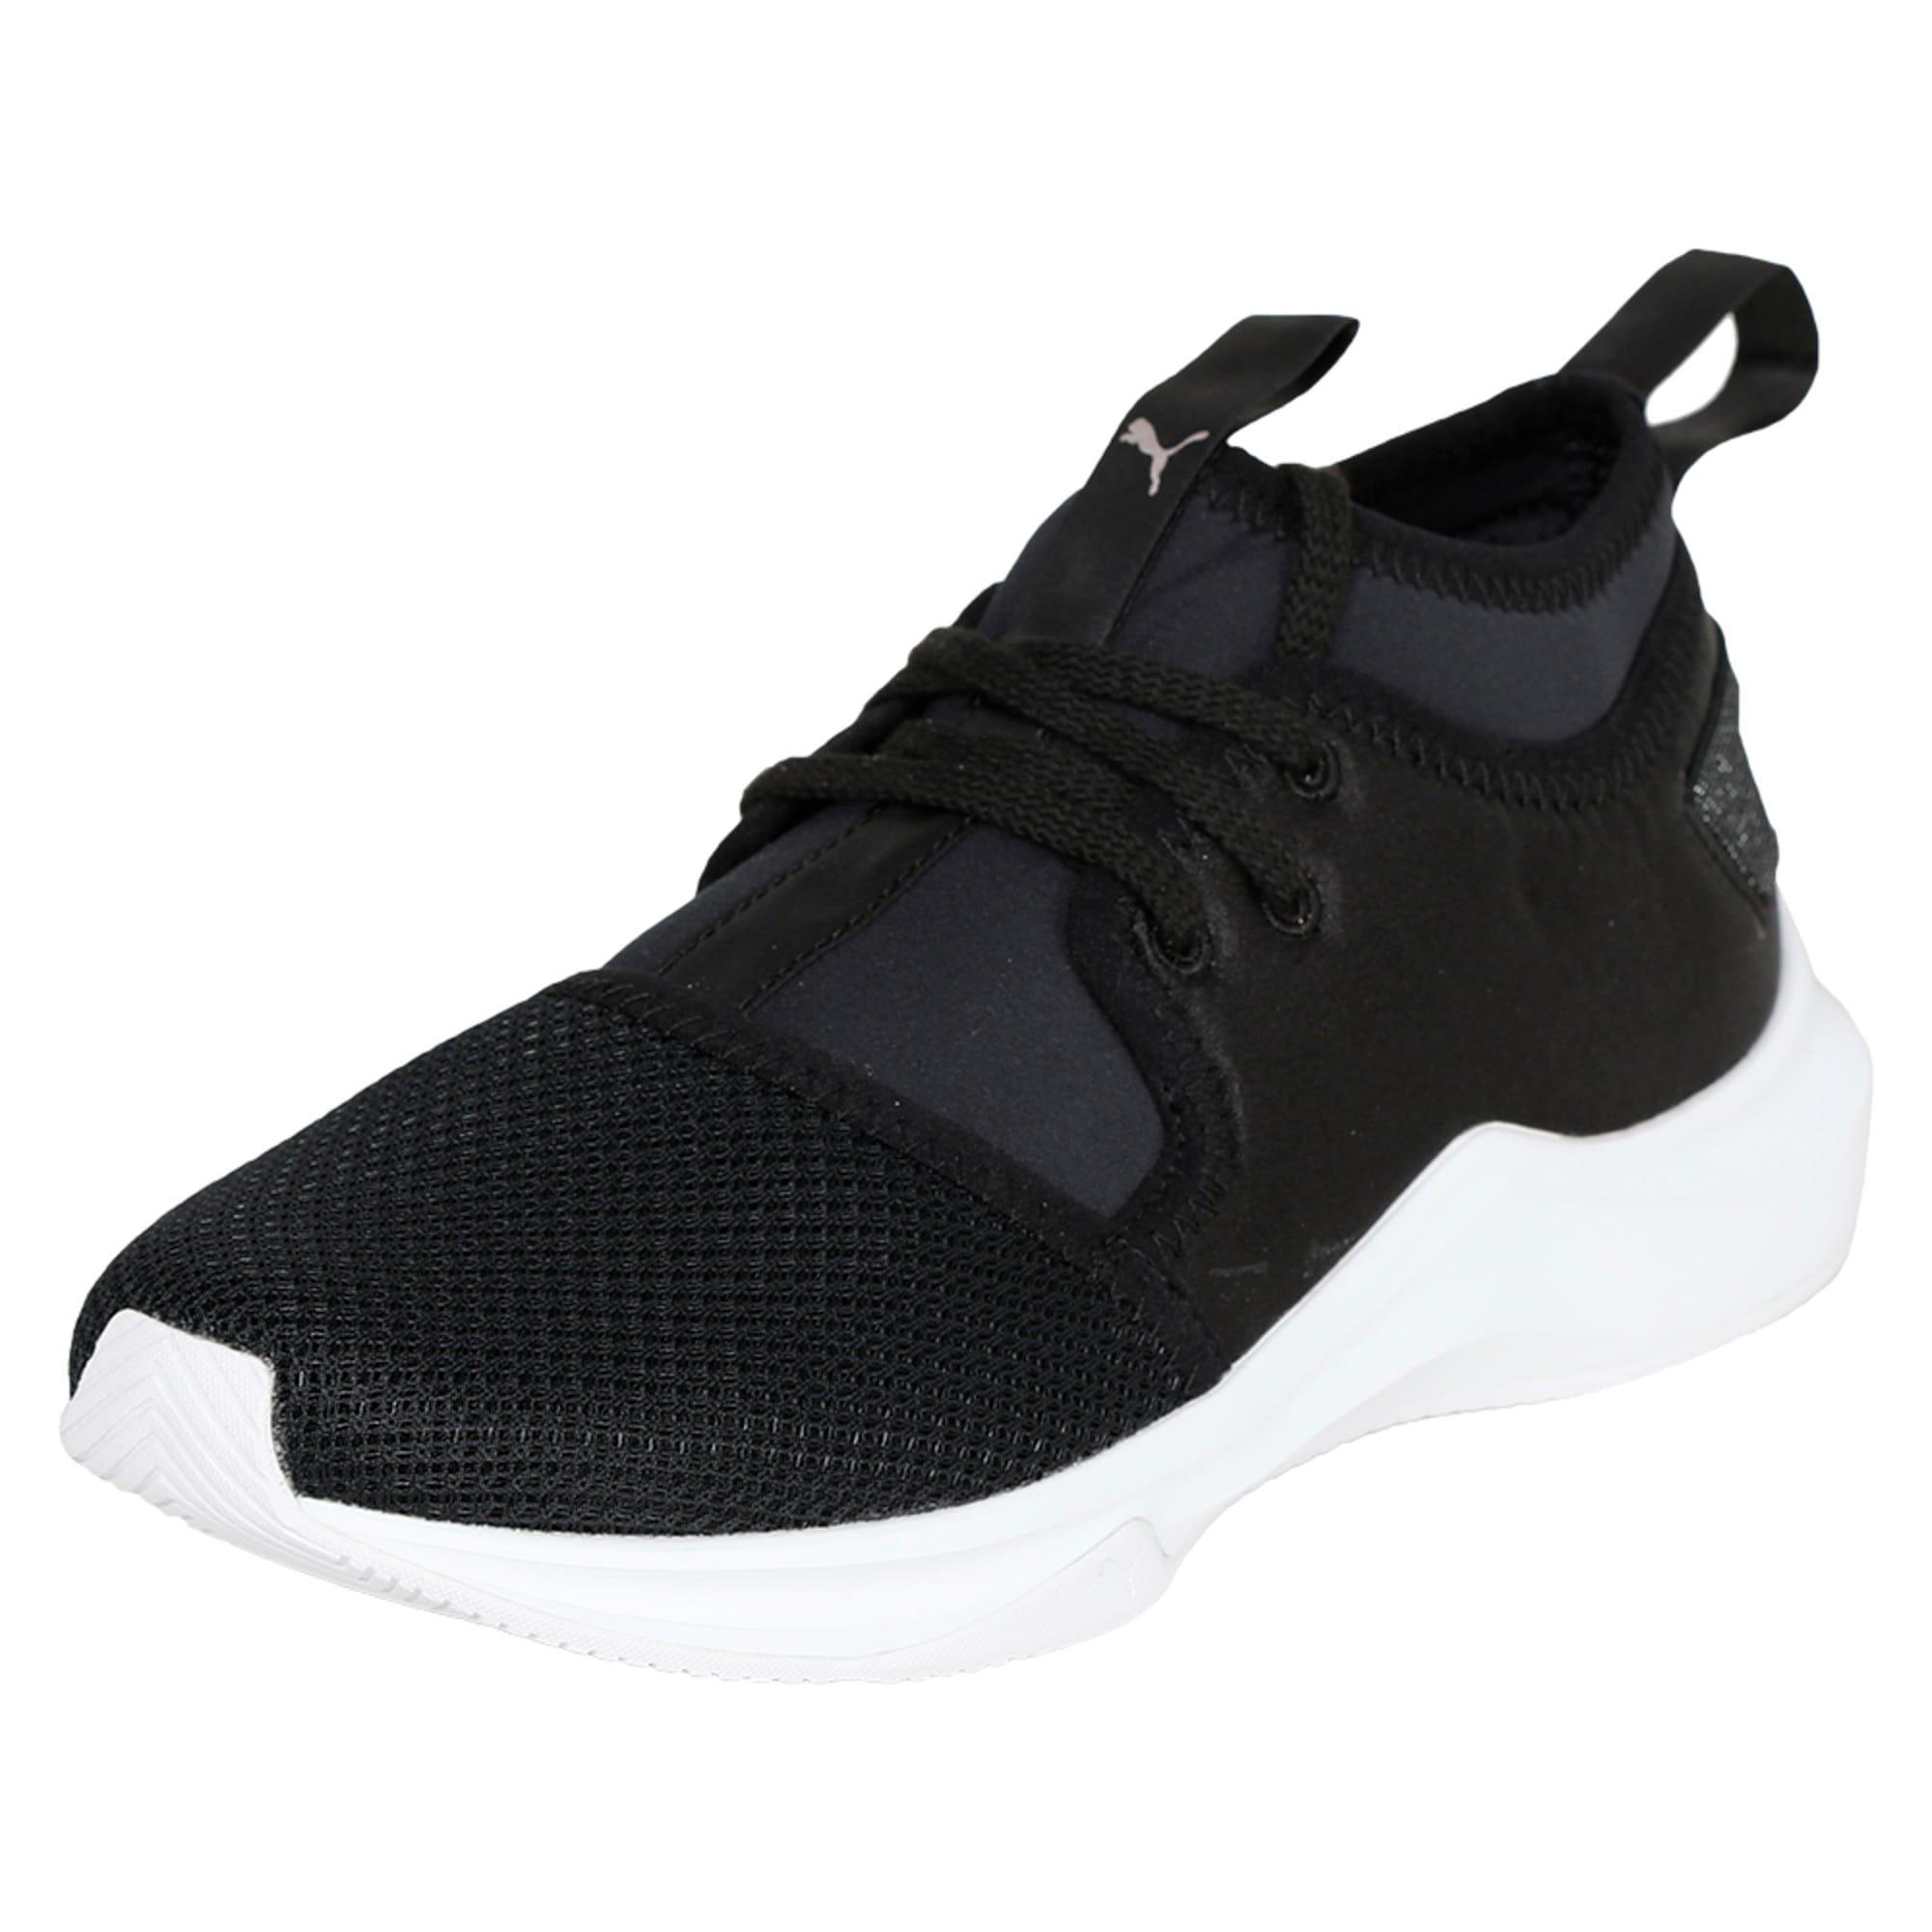 Thumbnail 1 of Phenom Satin Lo En Pointe Women's Training Shoes, Puma Black-Puma White, medium-IND